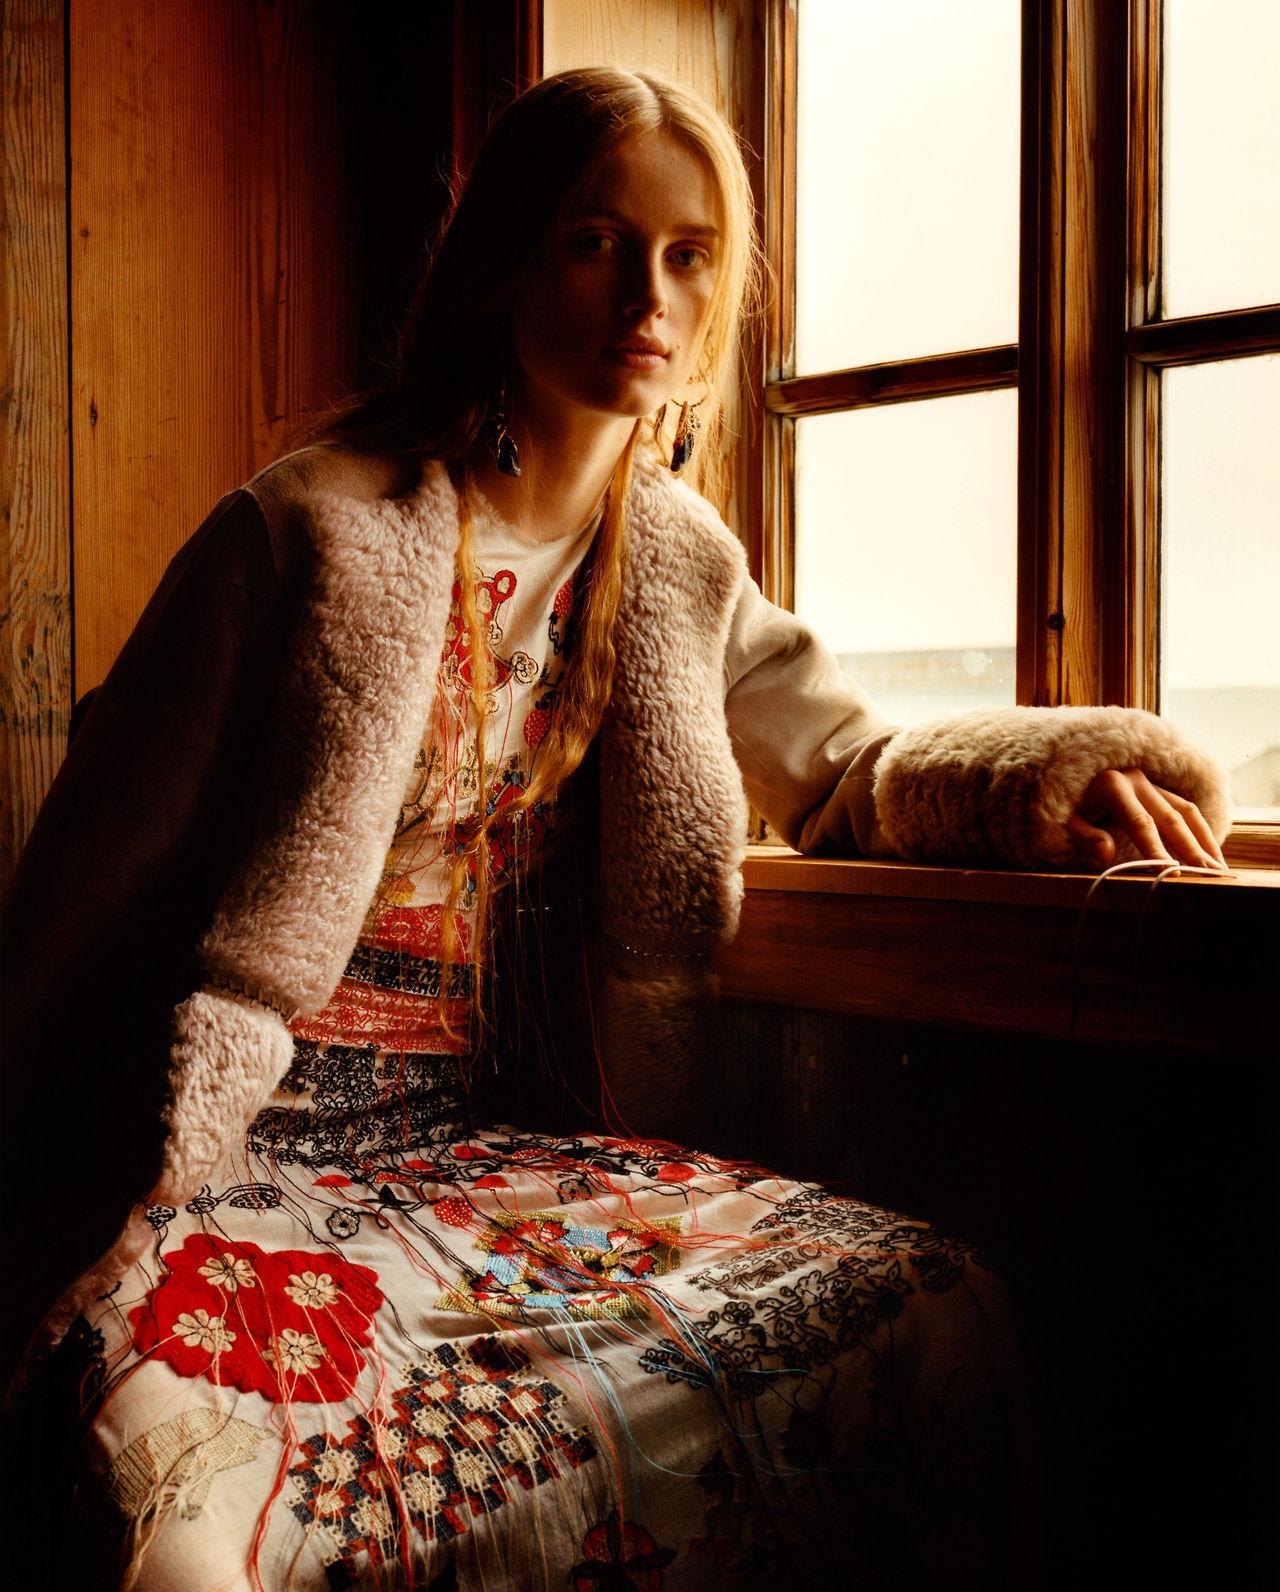 Rianne Van Rompaey - Alexander McQueen Fall/Winter 2017-2018 Part 1